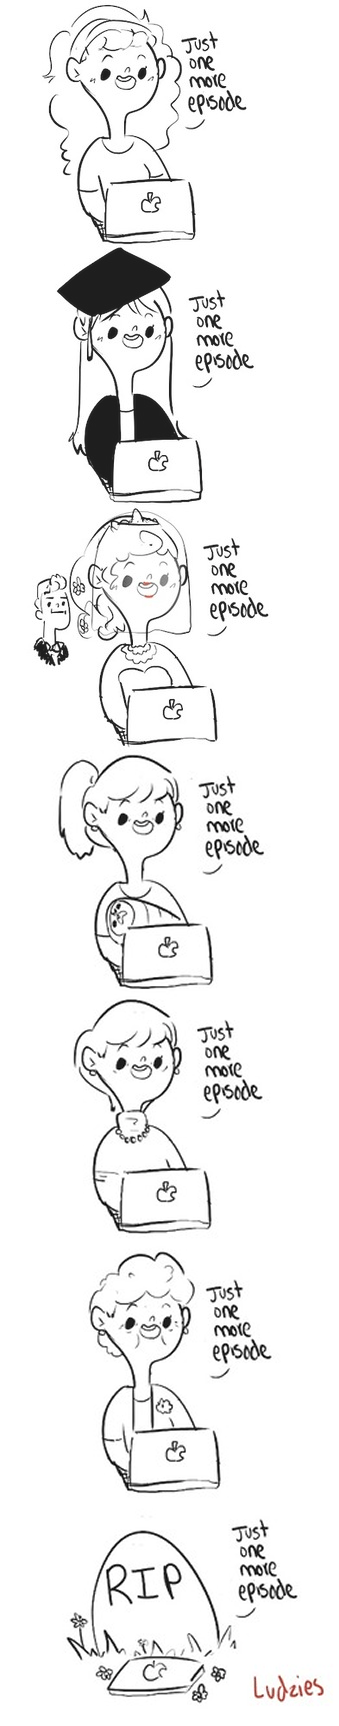 modern living TV funny web comics - 7856313856